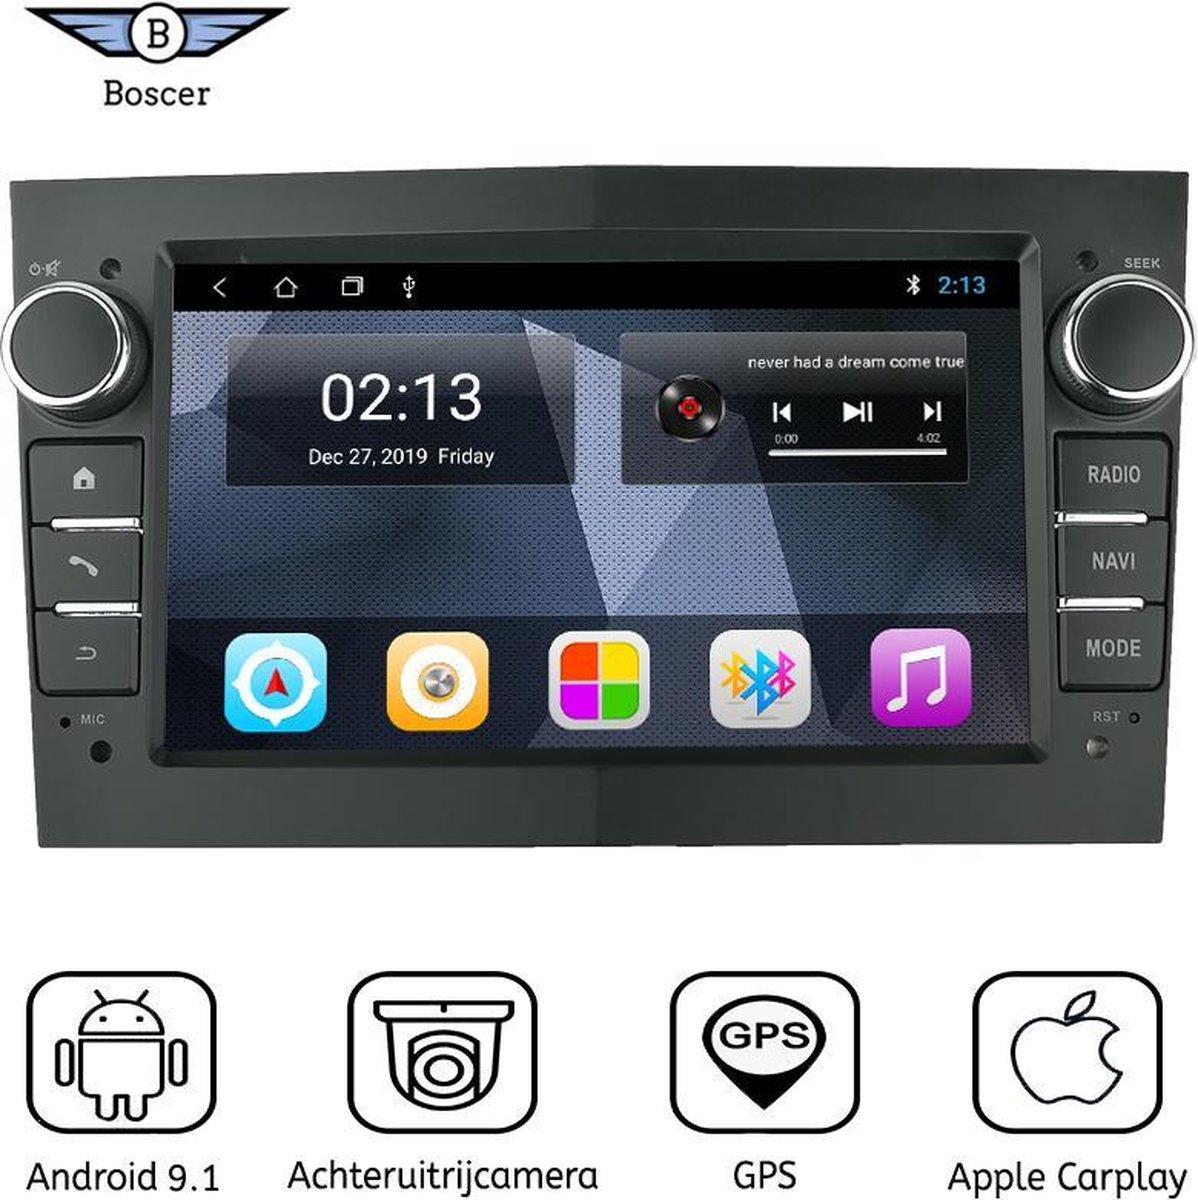 Boscer® Opel Autoradio | Android 9.1 | Apple Carplay | Android Auto | Navigatiesysteem | Zwart | Achteruitrijcamera